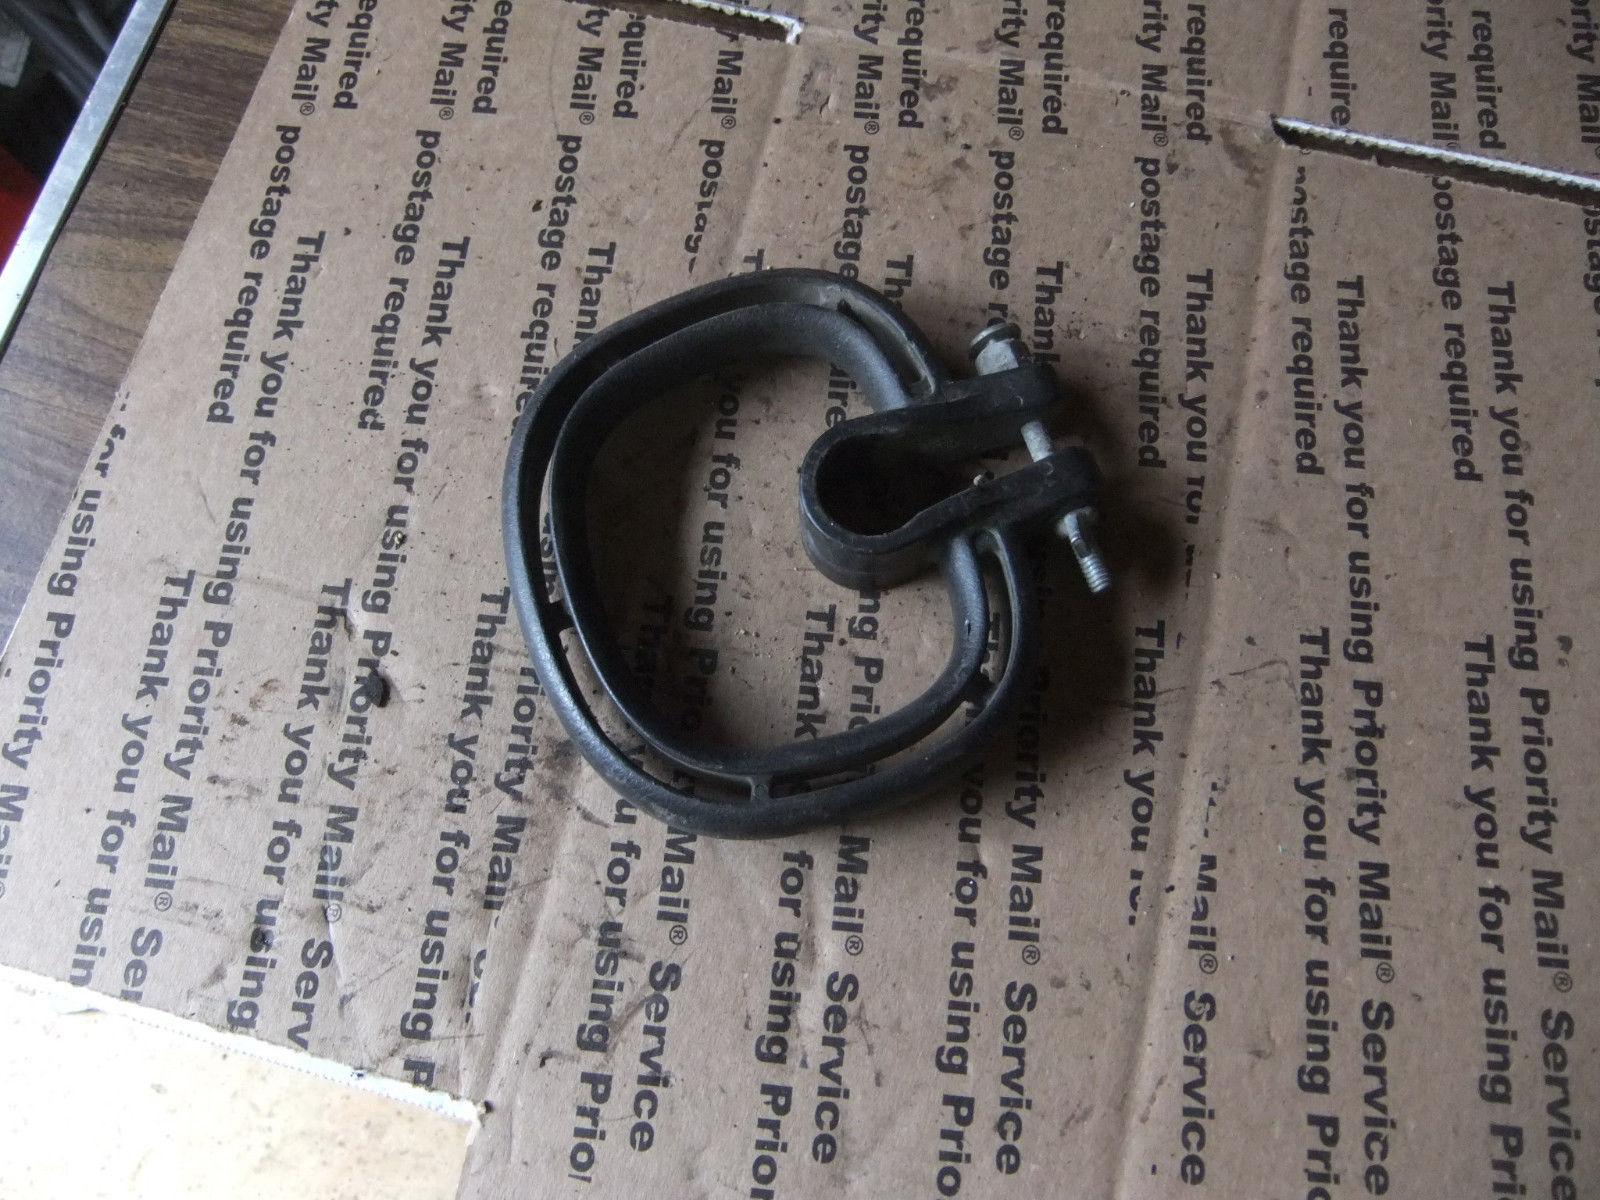 2011 Bolens String Trimmer  25 CC Handle